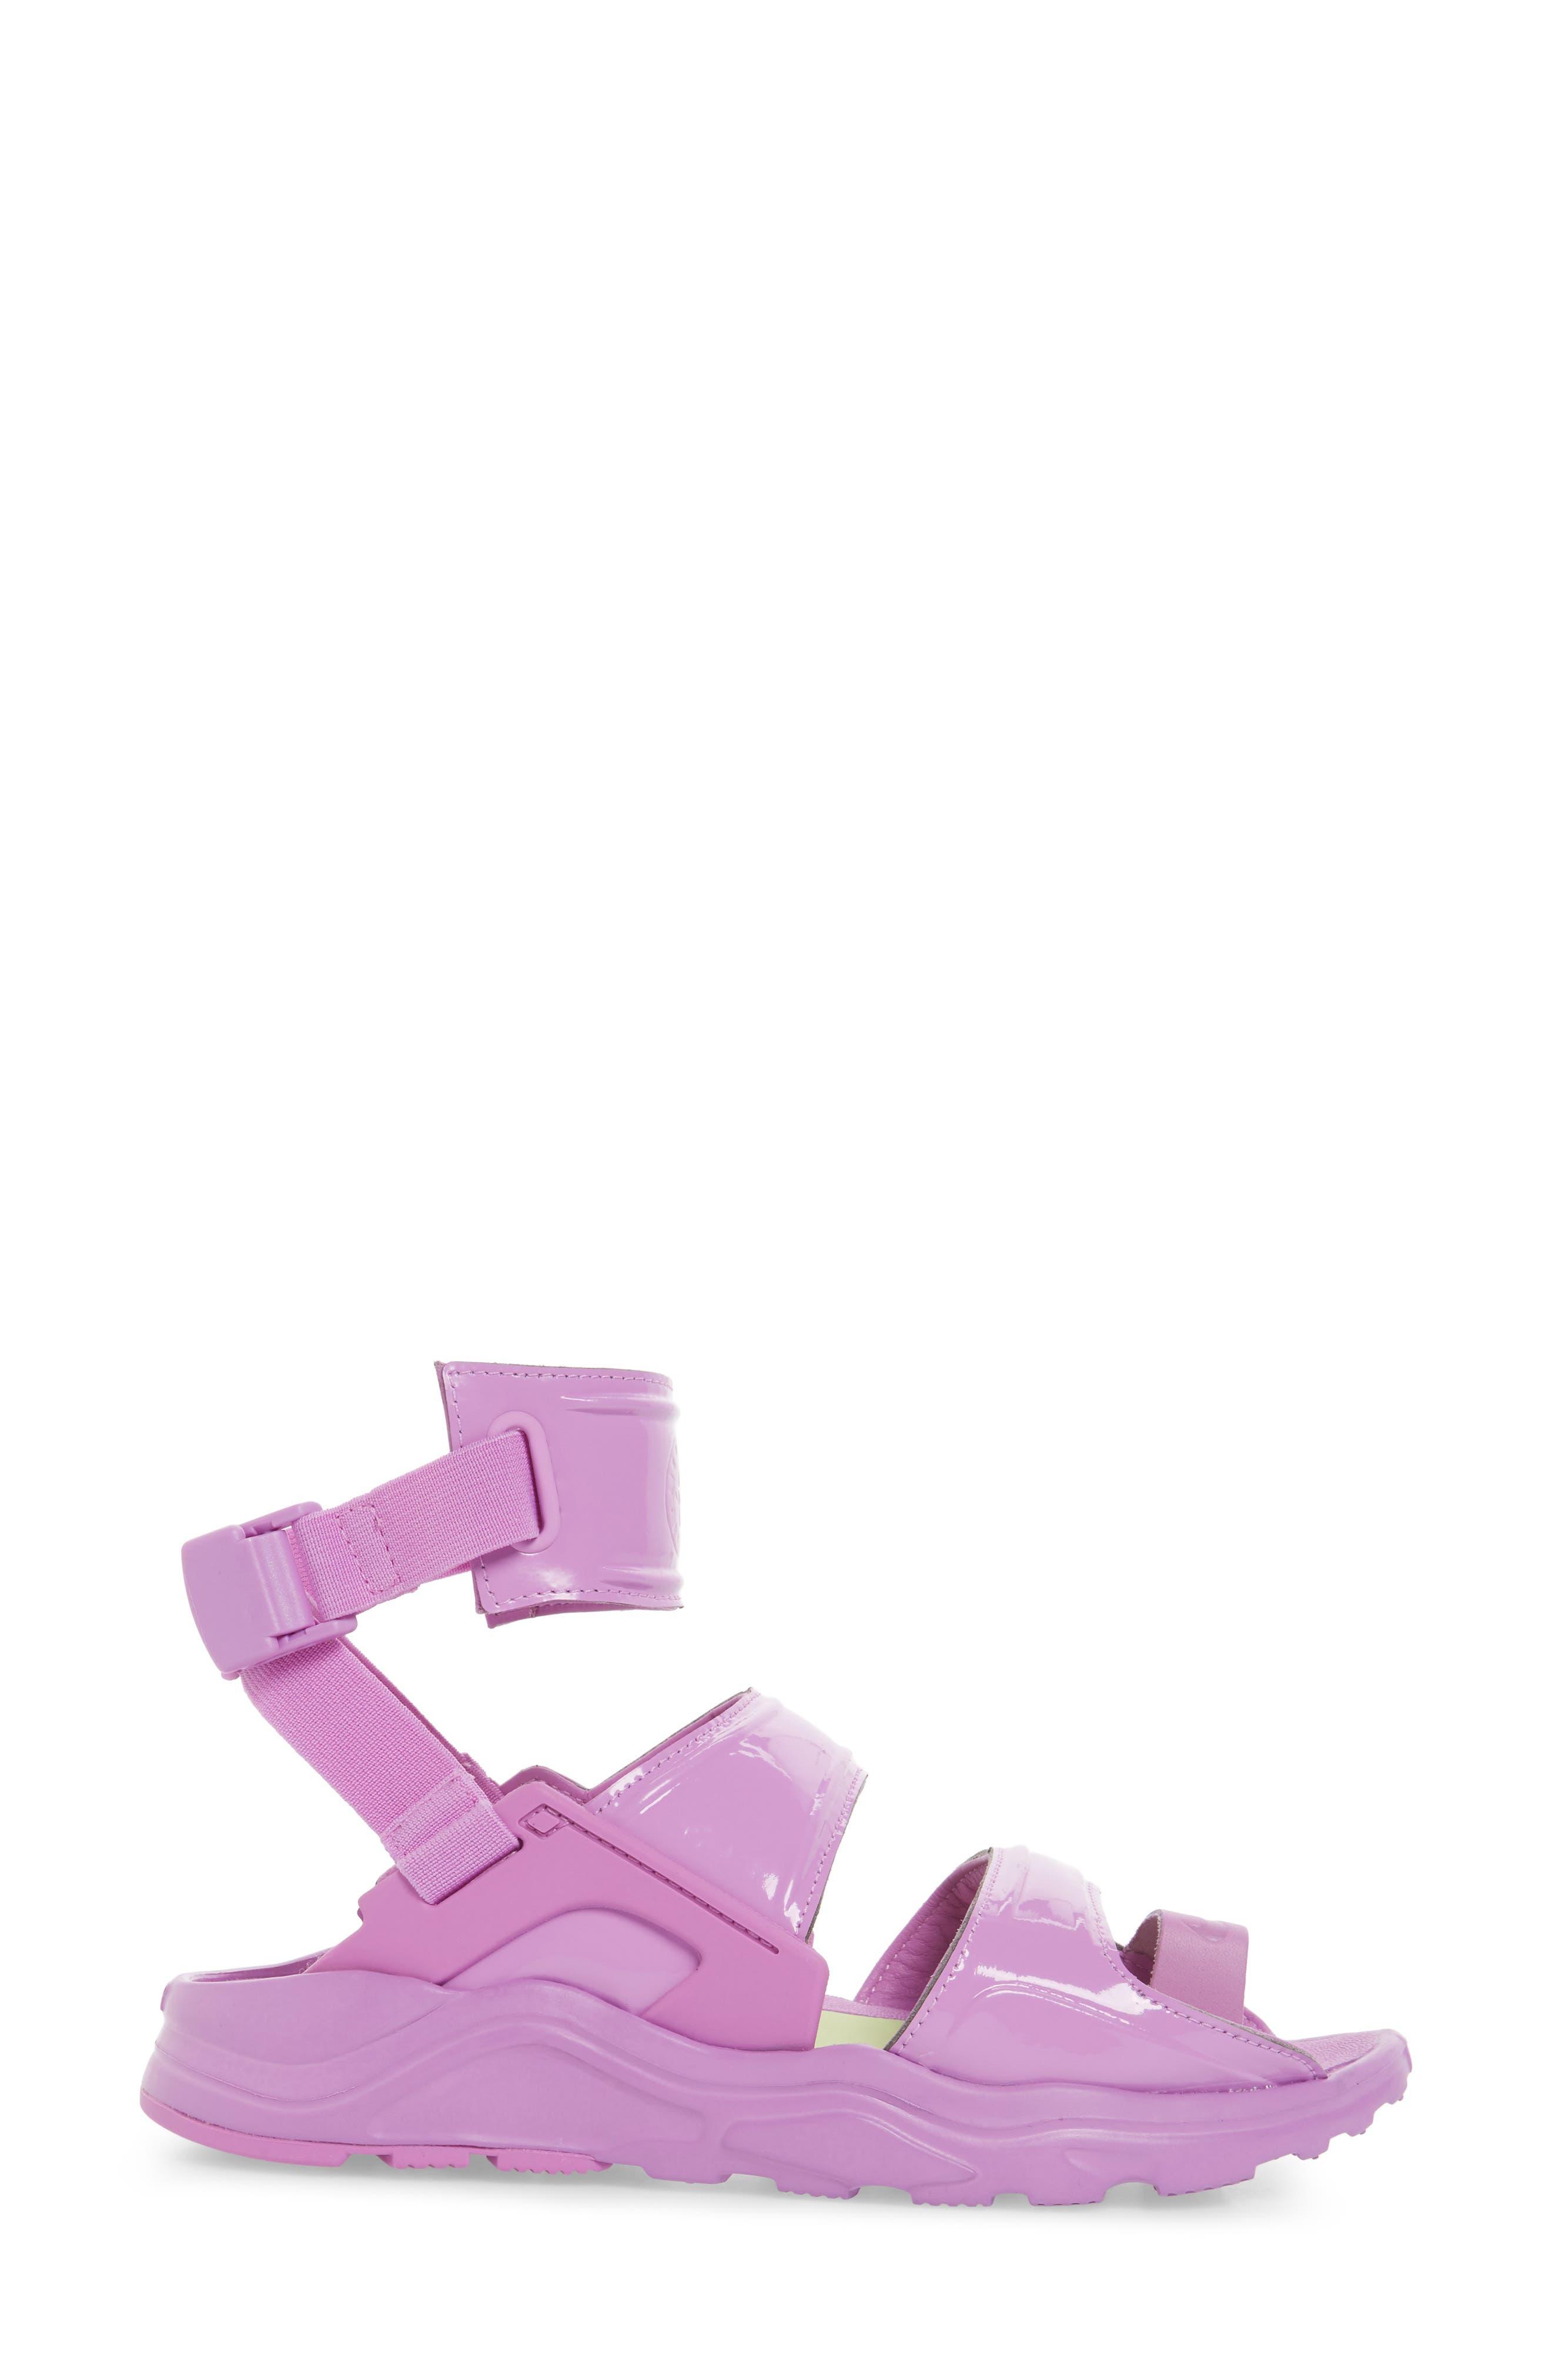 Air Huarache Gladiator Sandal,                             Alternate thumbnail 4, color,                             Fuchsia Glow